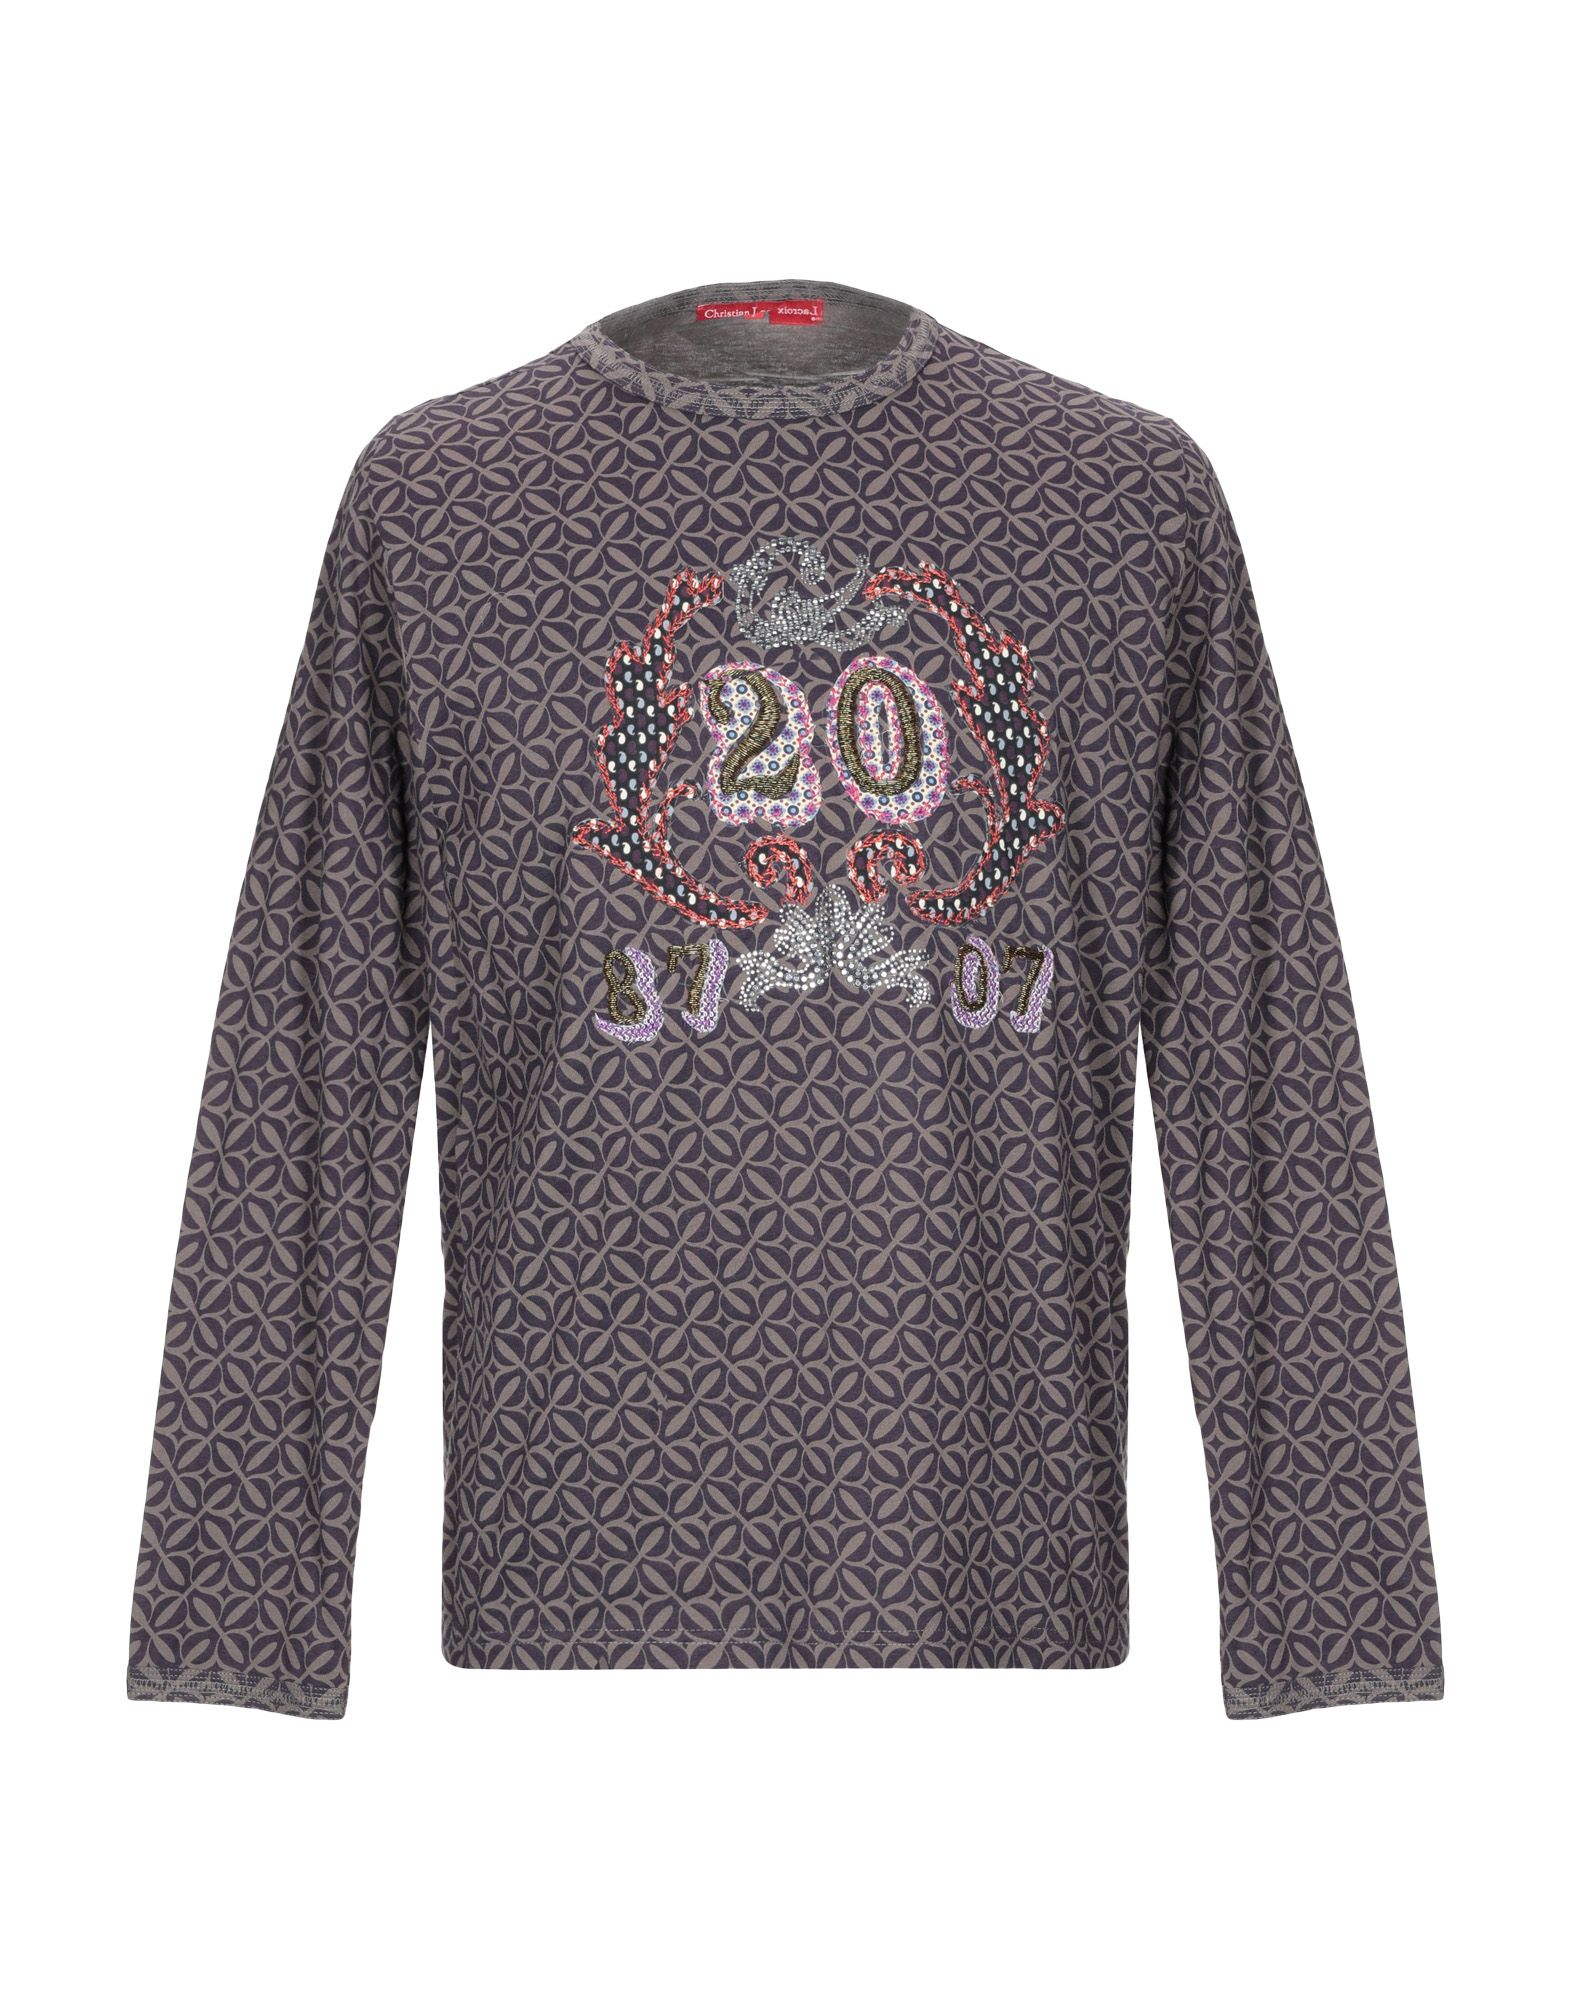 T-Shirt Christian Lacroix Homme herren - 12284355VQ